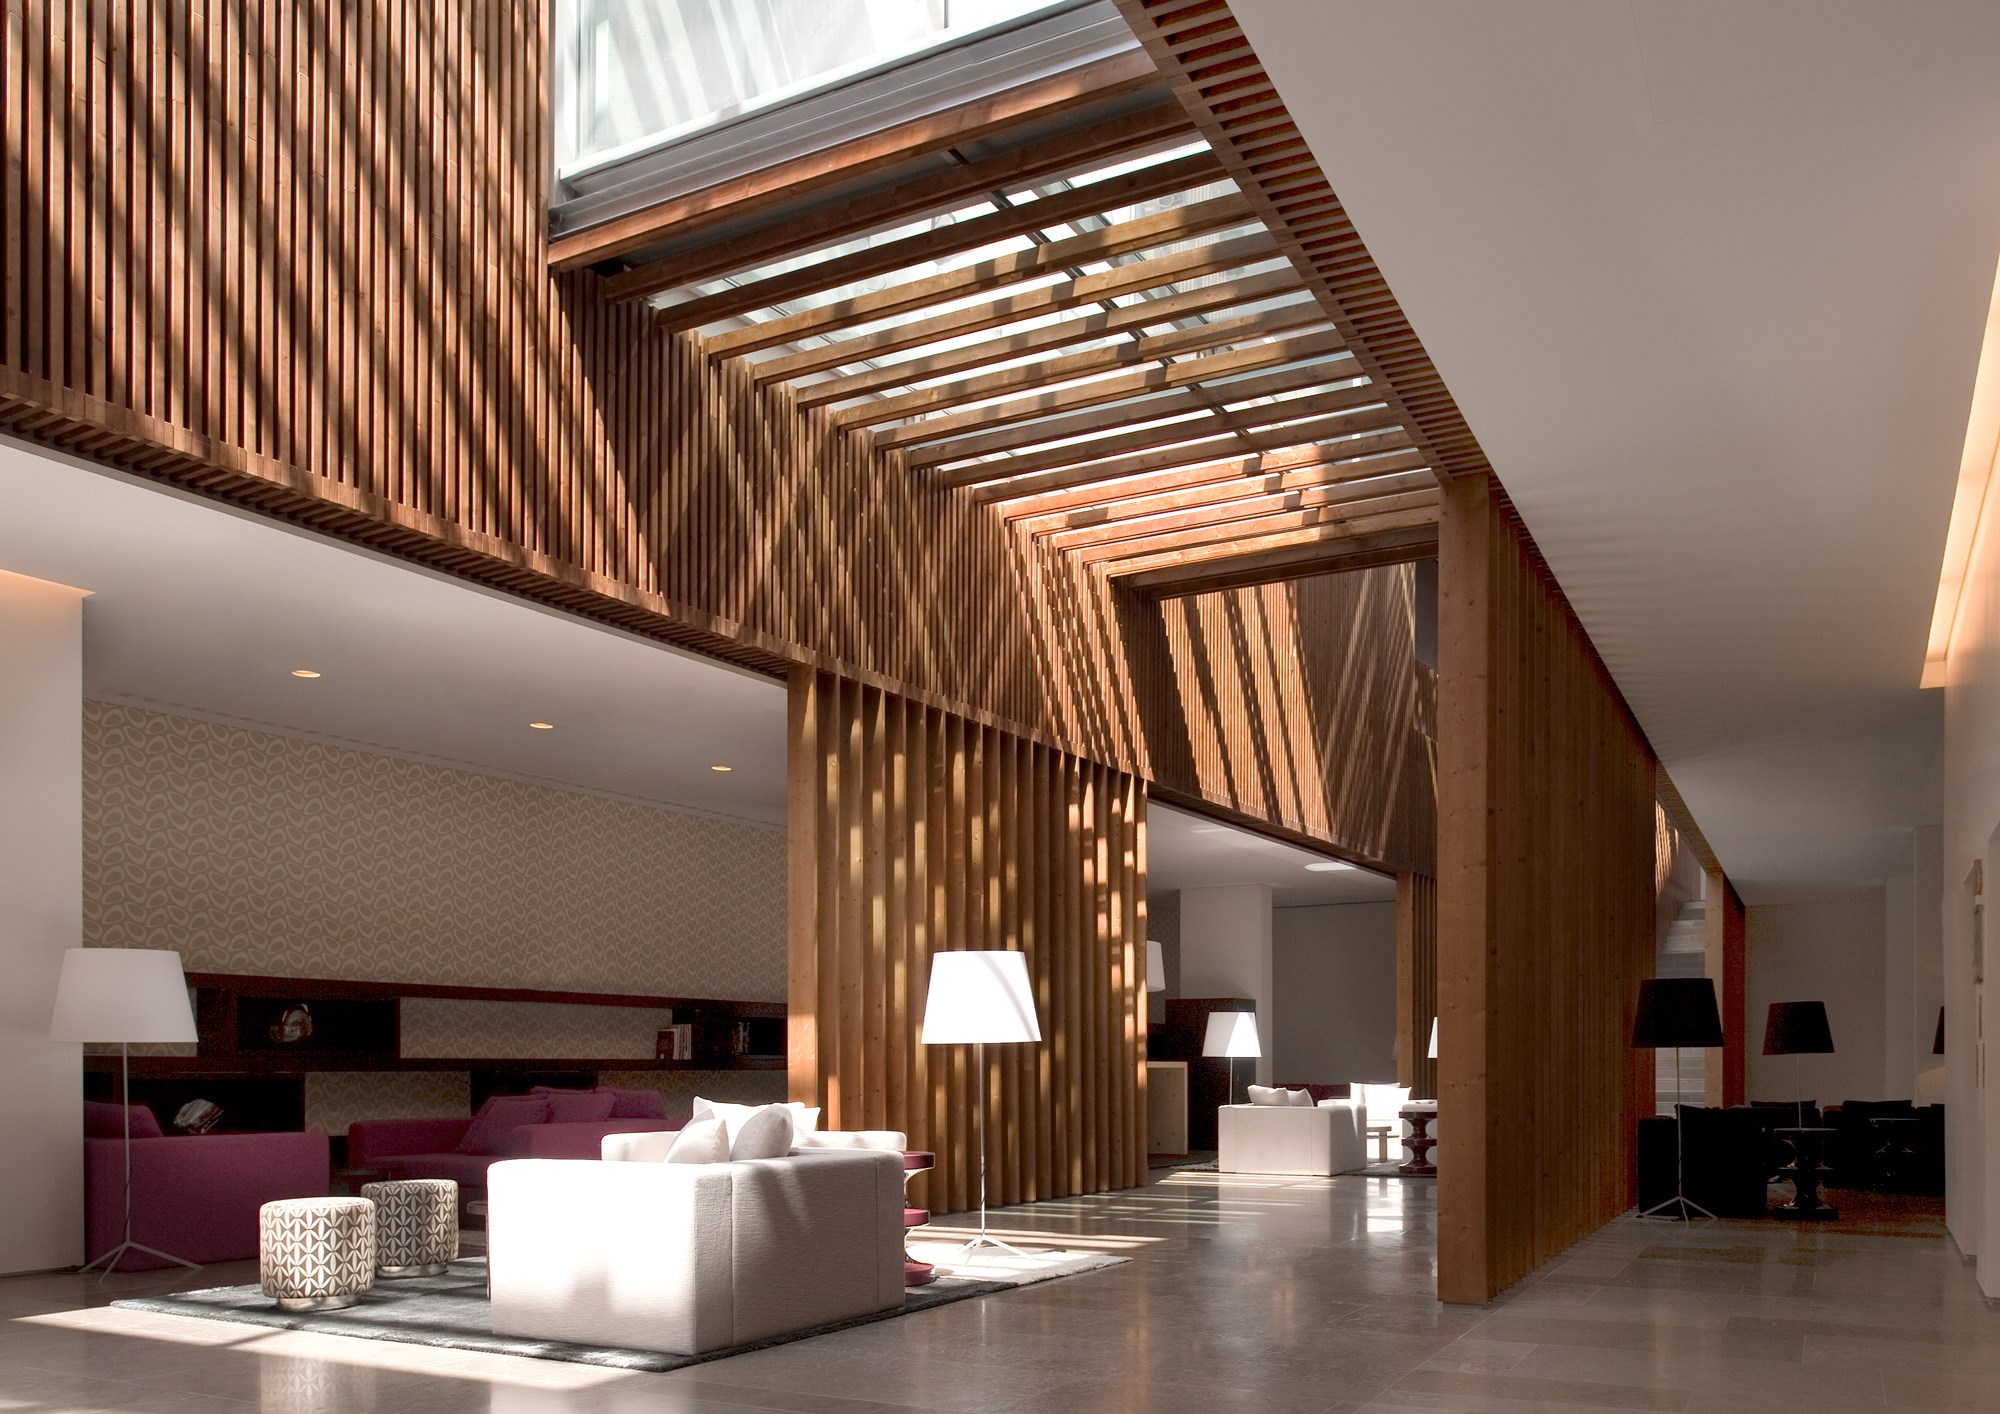 Promontorio Inspira Santa Marta Hotel